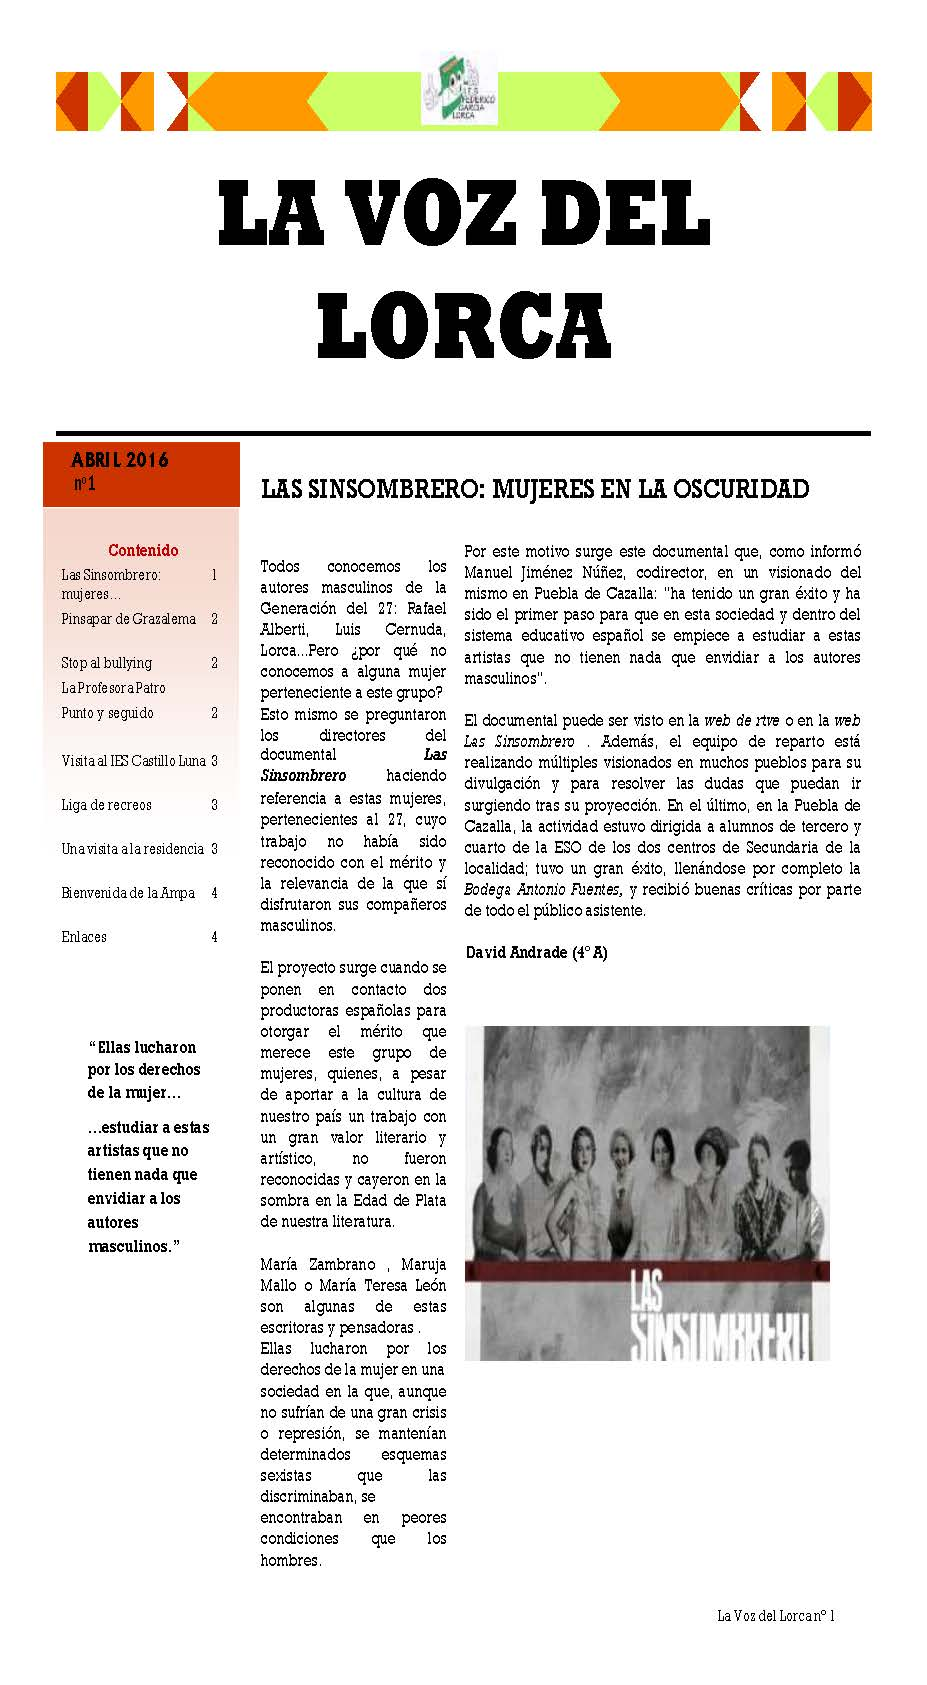 LA VOZ DEL LORCA1b_Página_1